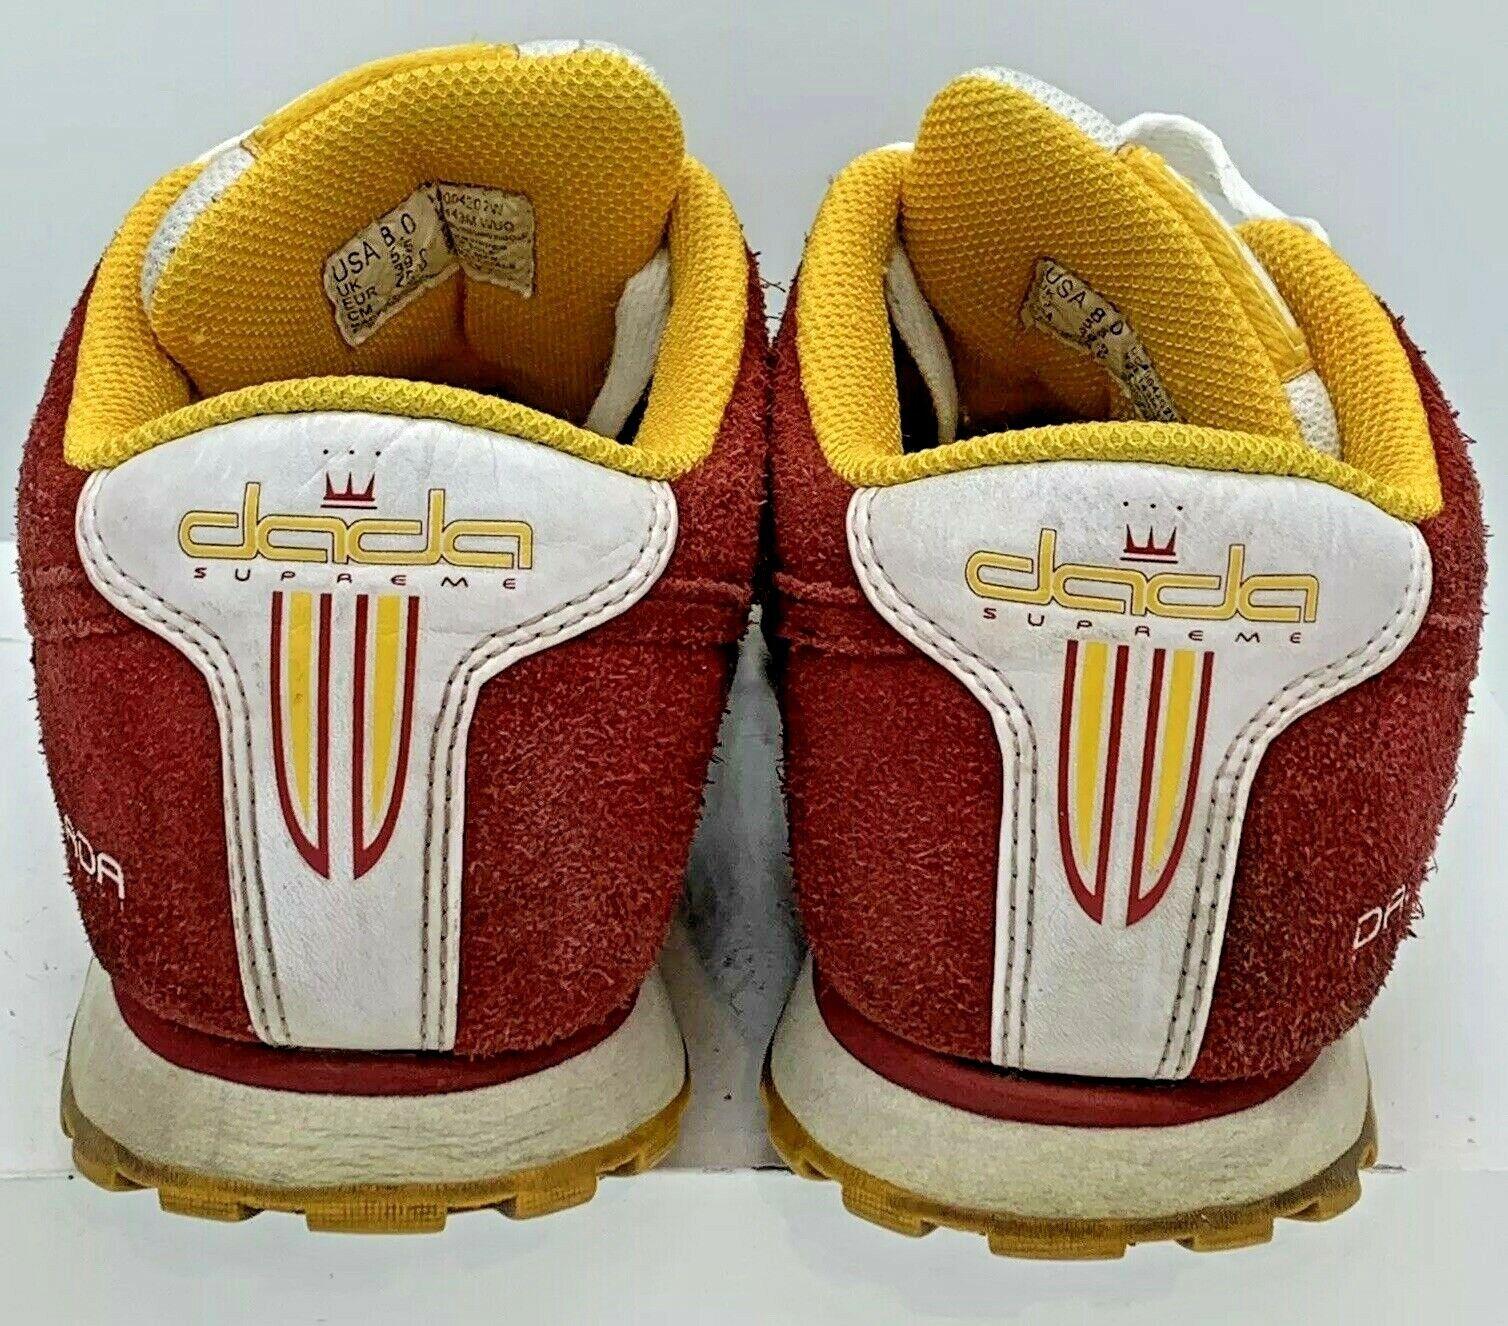 Dada Supreme Supreme Supreme Donna  rosso bianca giallo Parkour Running Athletic Crown scarpe US 8 7c67a4